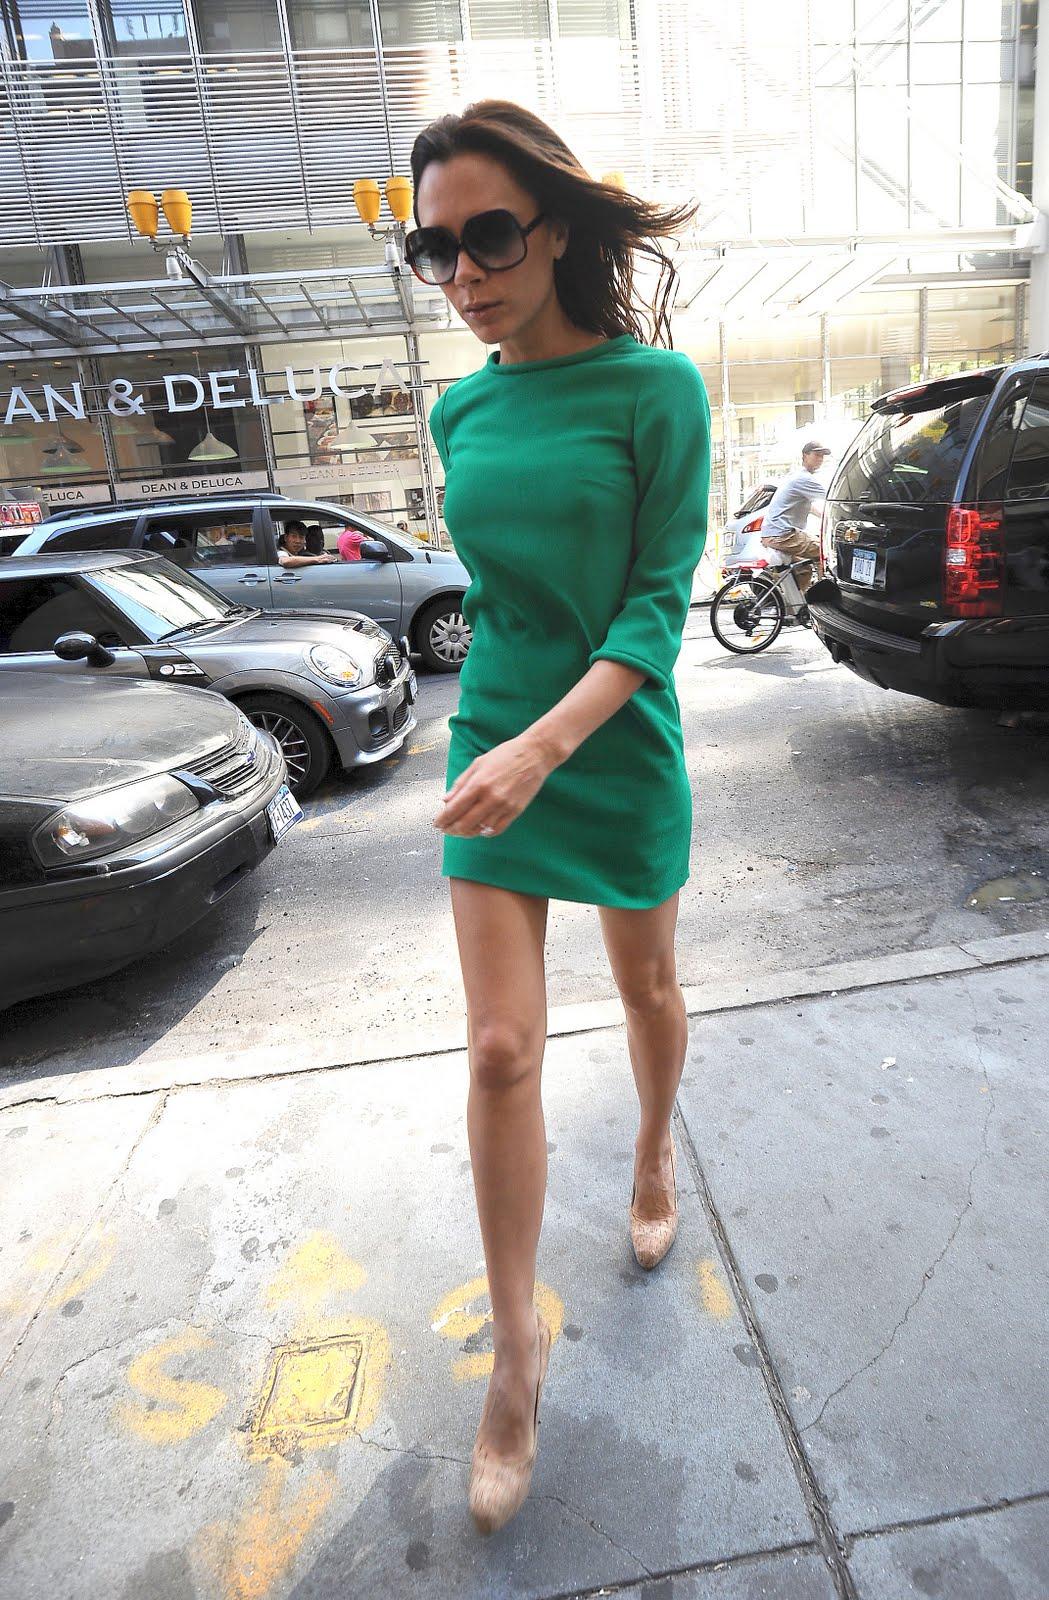 http://2.bp.blogspot.com/_5wt45Sgxoi8/TIno4wTH-TI/AAAAAAAAB2g/c7niYMXwPV0/s1600/victoria_beckham_legs_4.jpg